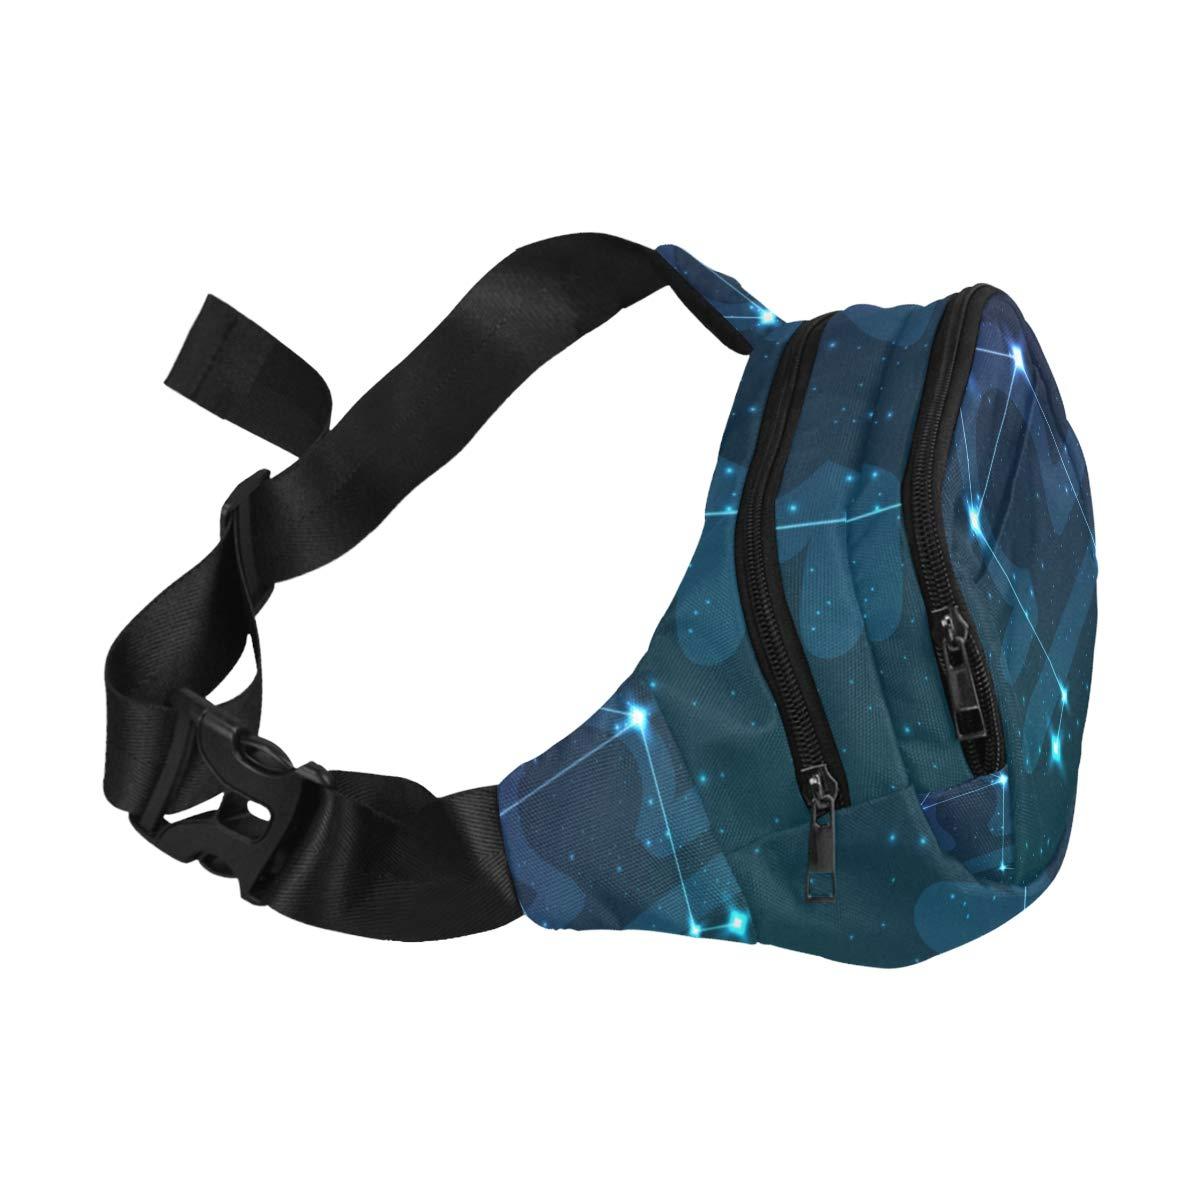 Constellation Zodiac Sign Libra Fenny Packs Waist Bags Adjustable Belt Waterproof Nylon Travel Running Sport Vacation Party For Men Women Boys Girls Kids